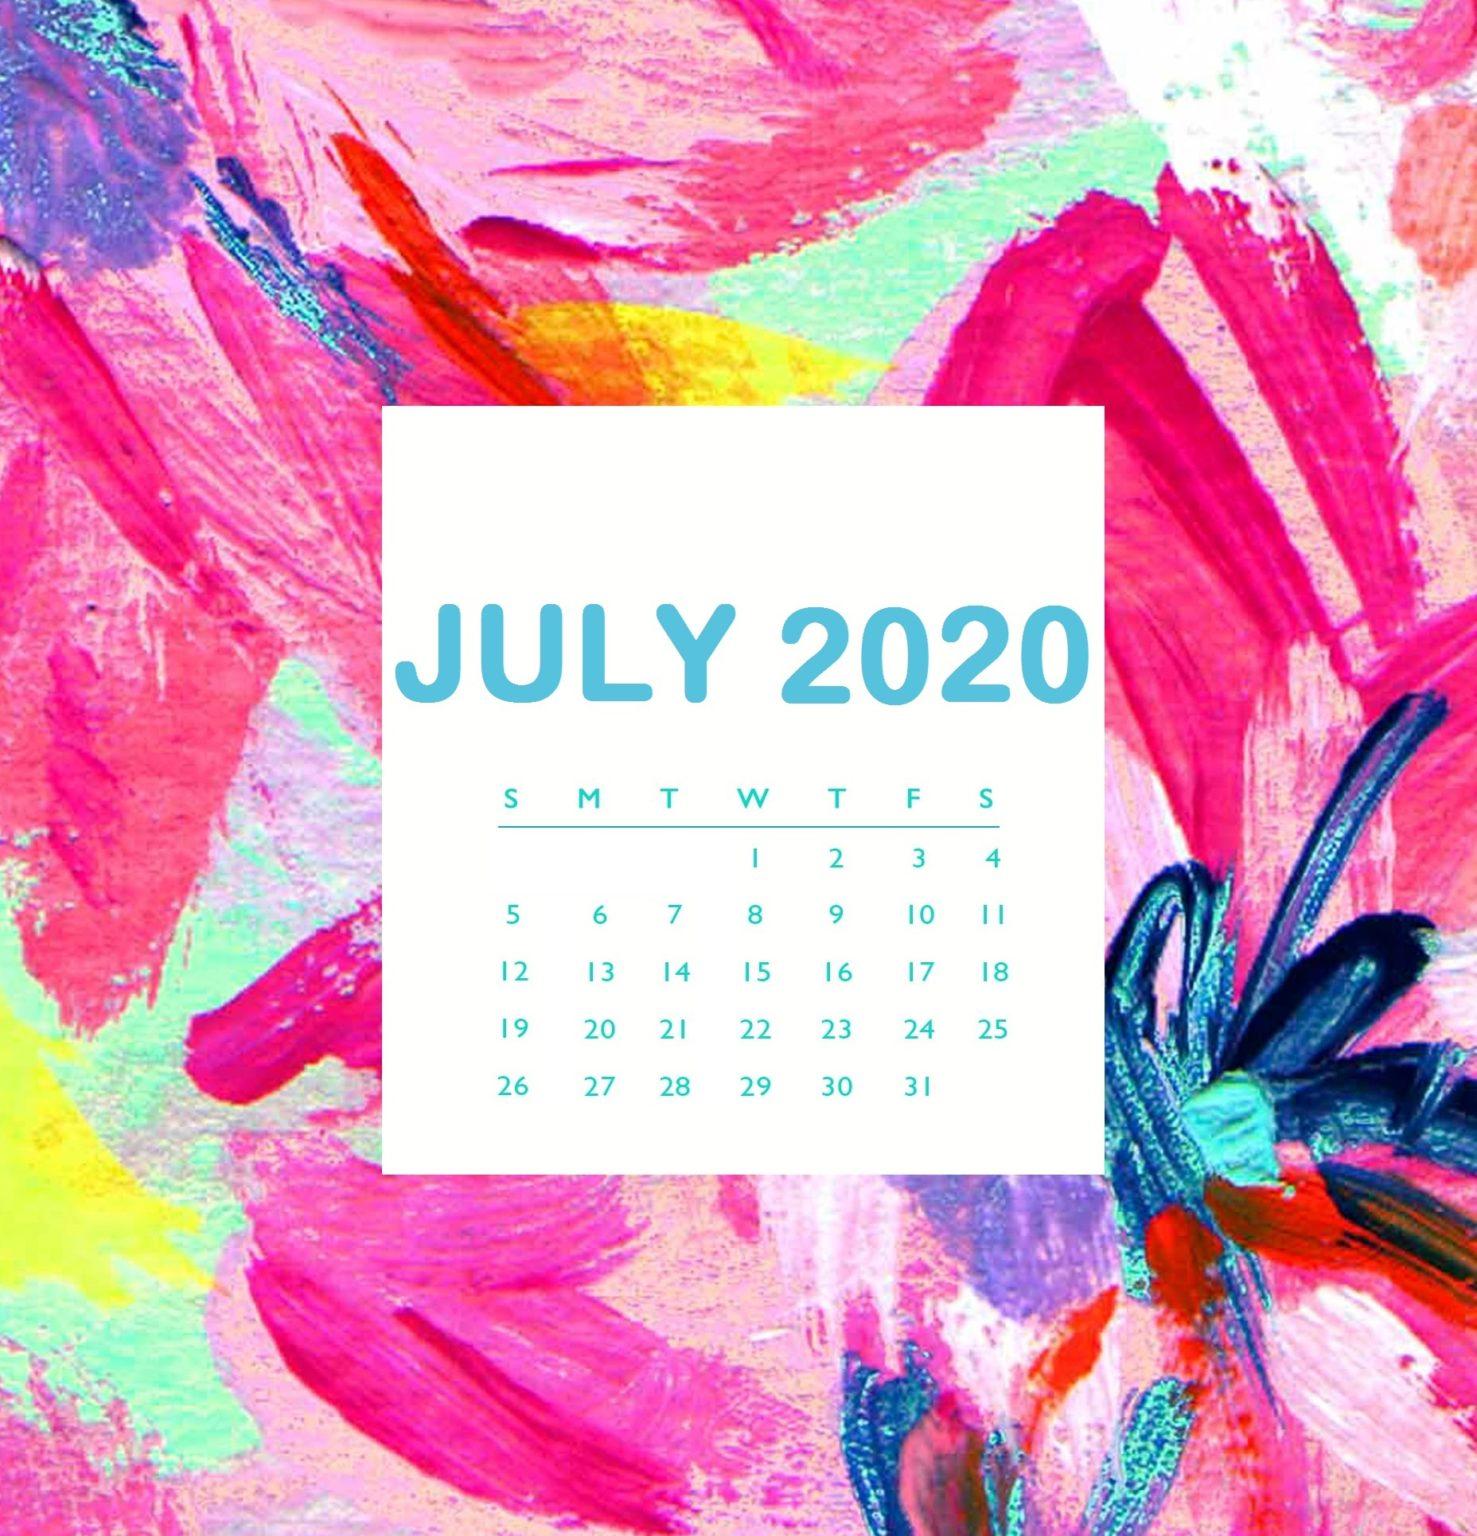 Beautiful July 2020 iPhone Wallpaper